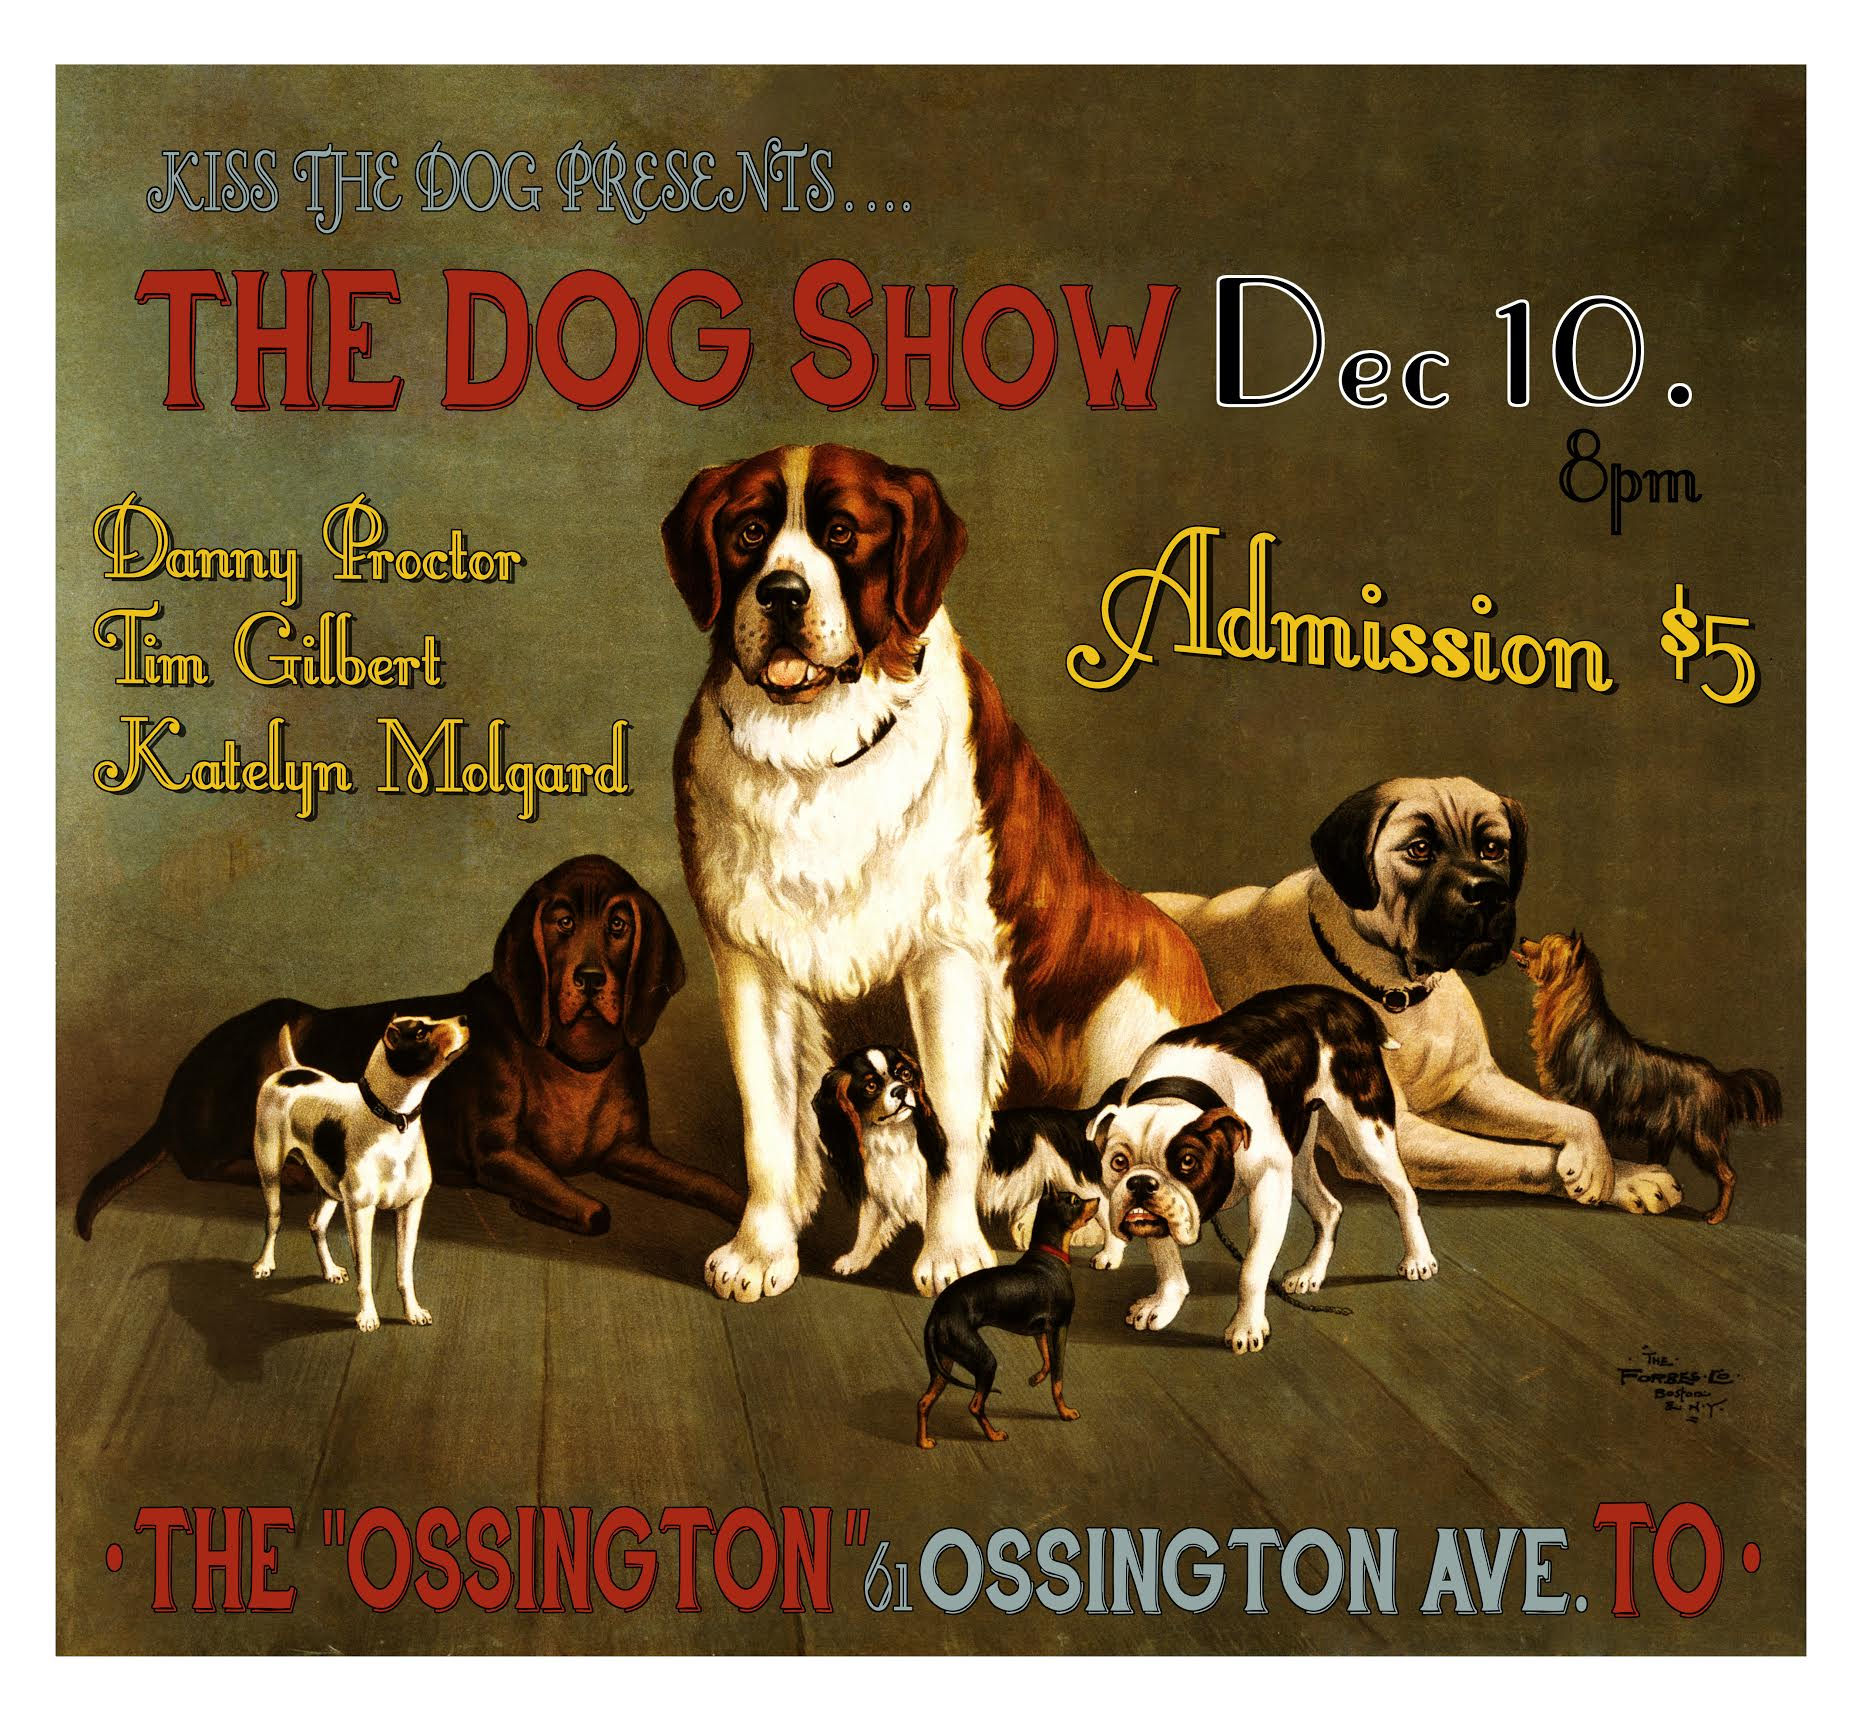 The Dog Show Flyer.jpg